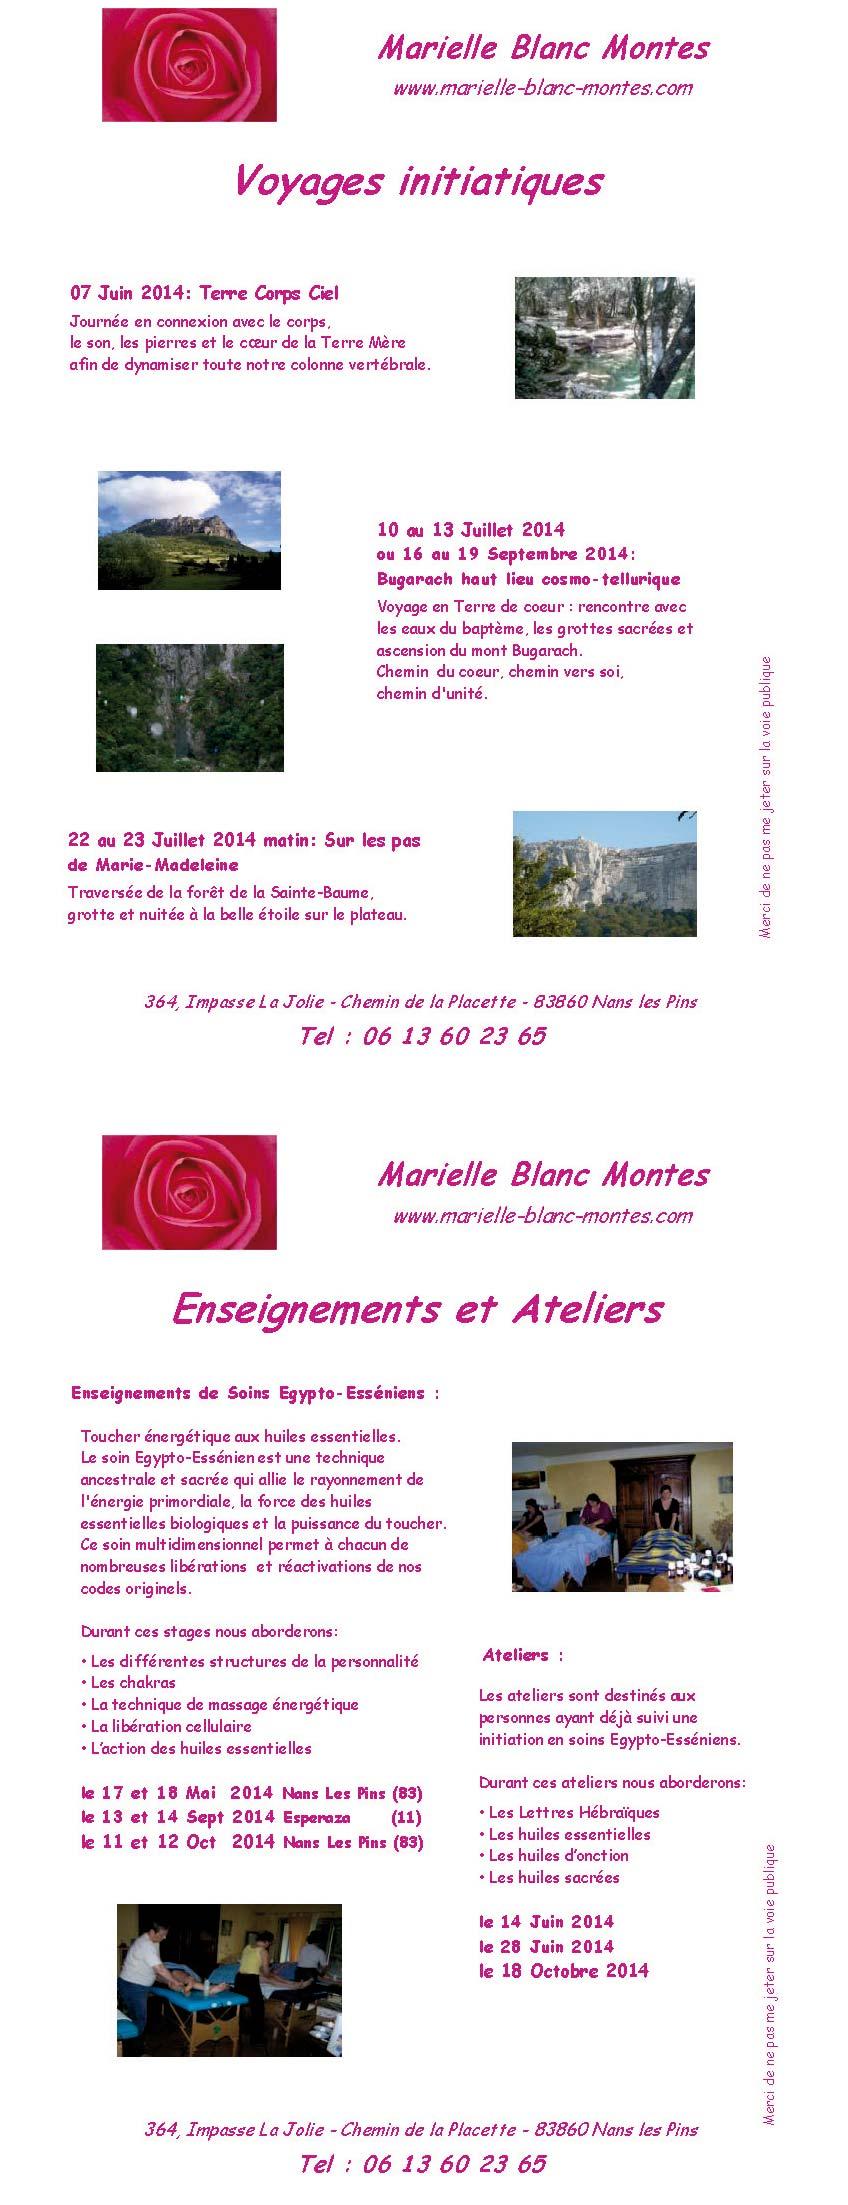 marielle_blanc_montes_29-05